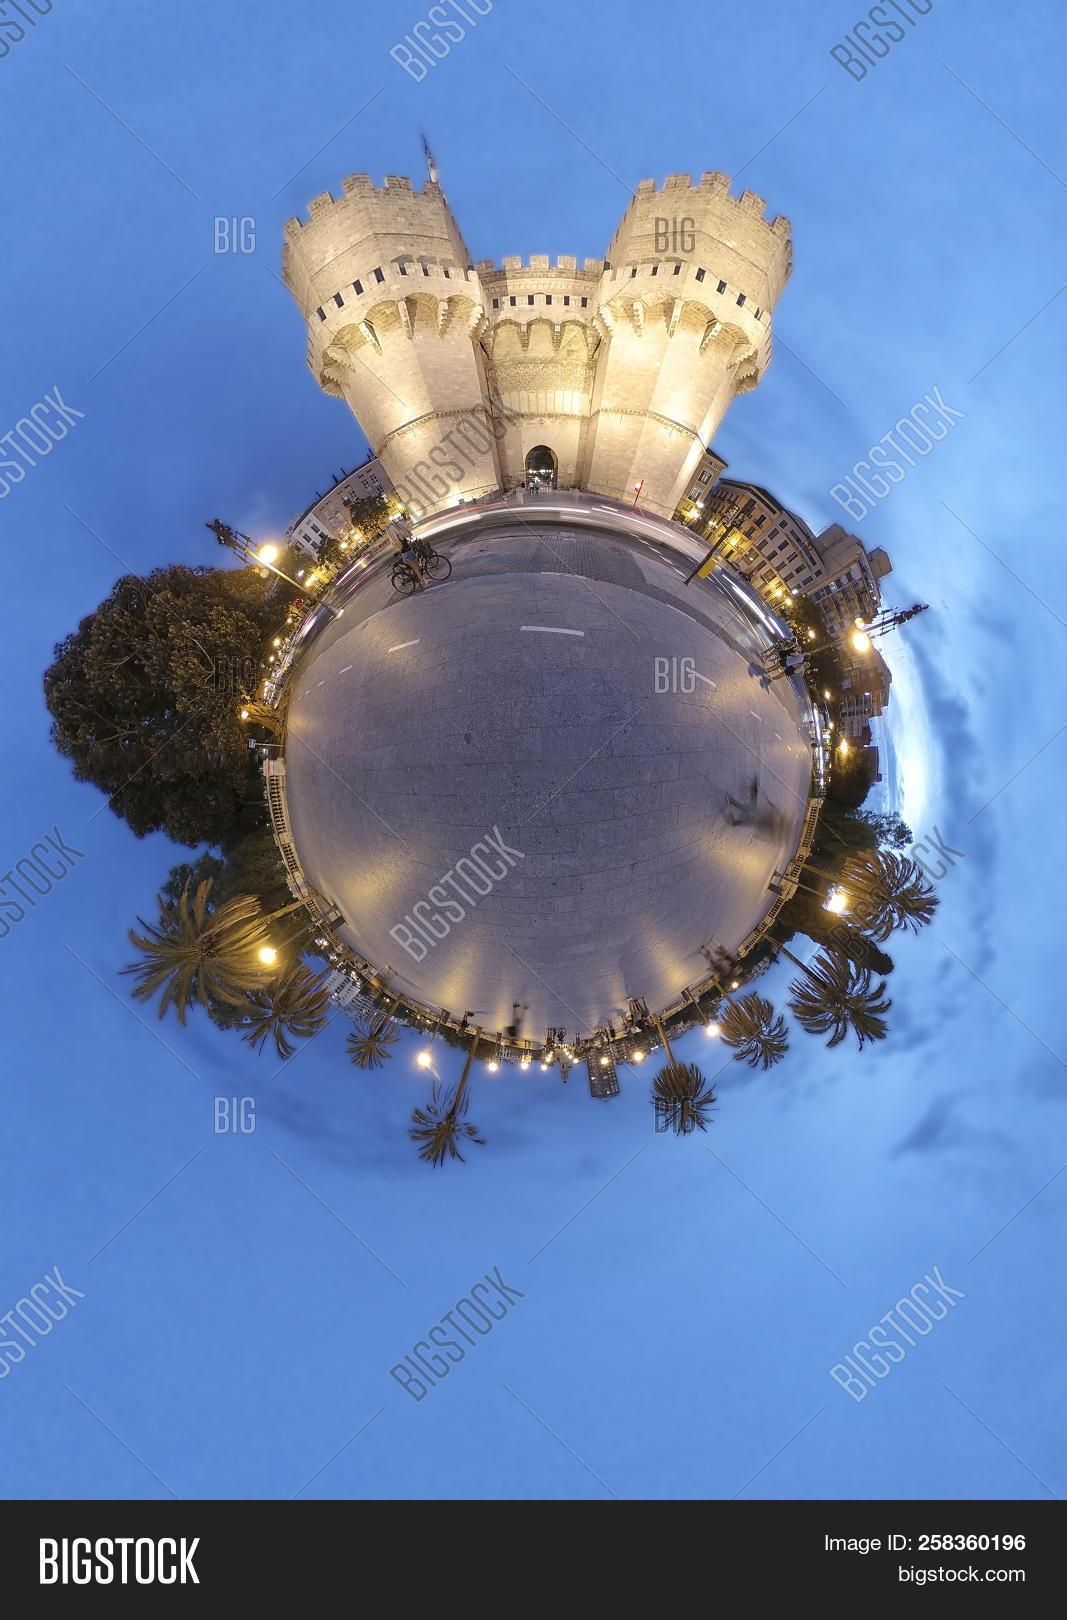 Serrano Towers Little Image & Photo (Free Trial) | Bigstock